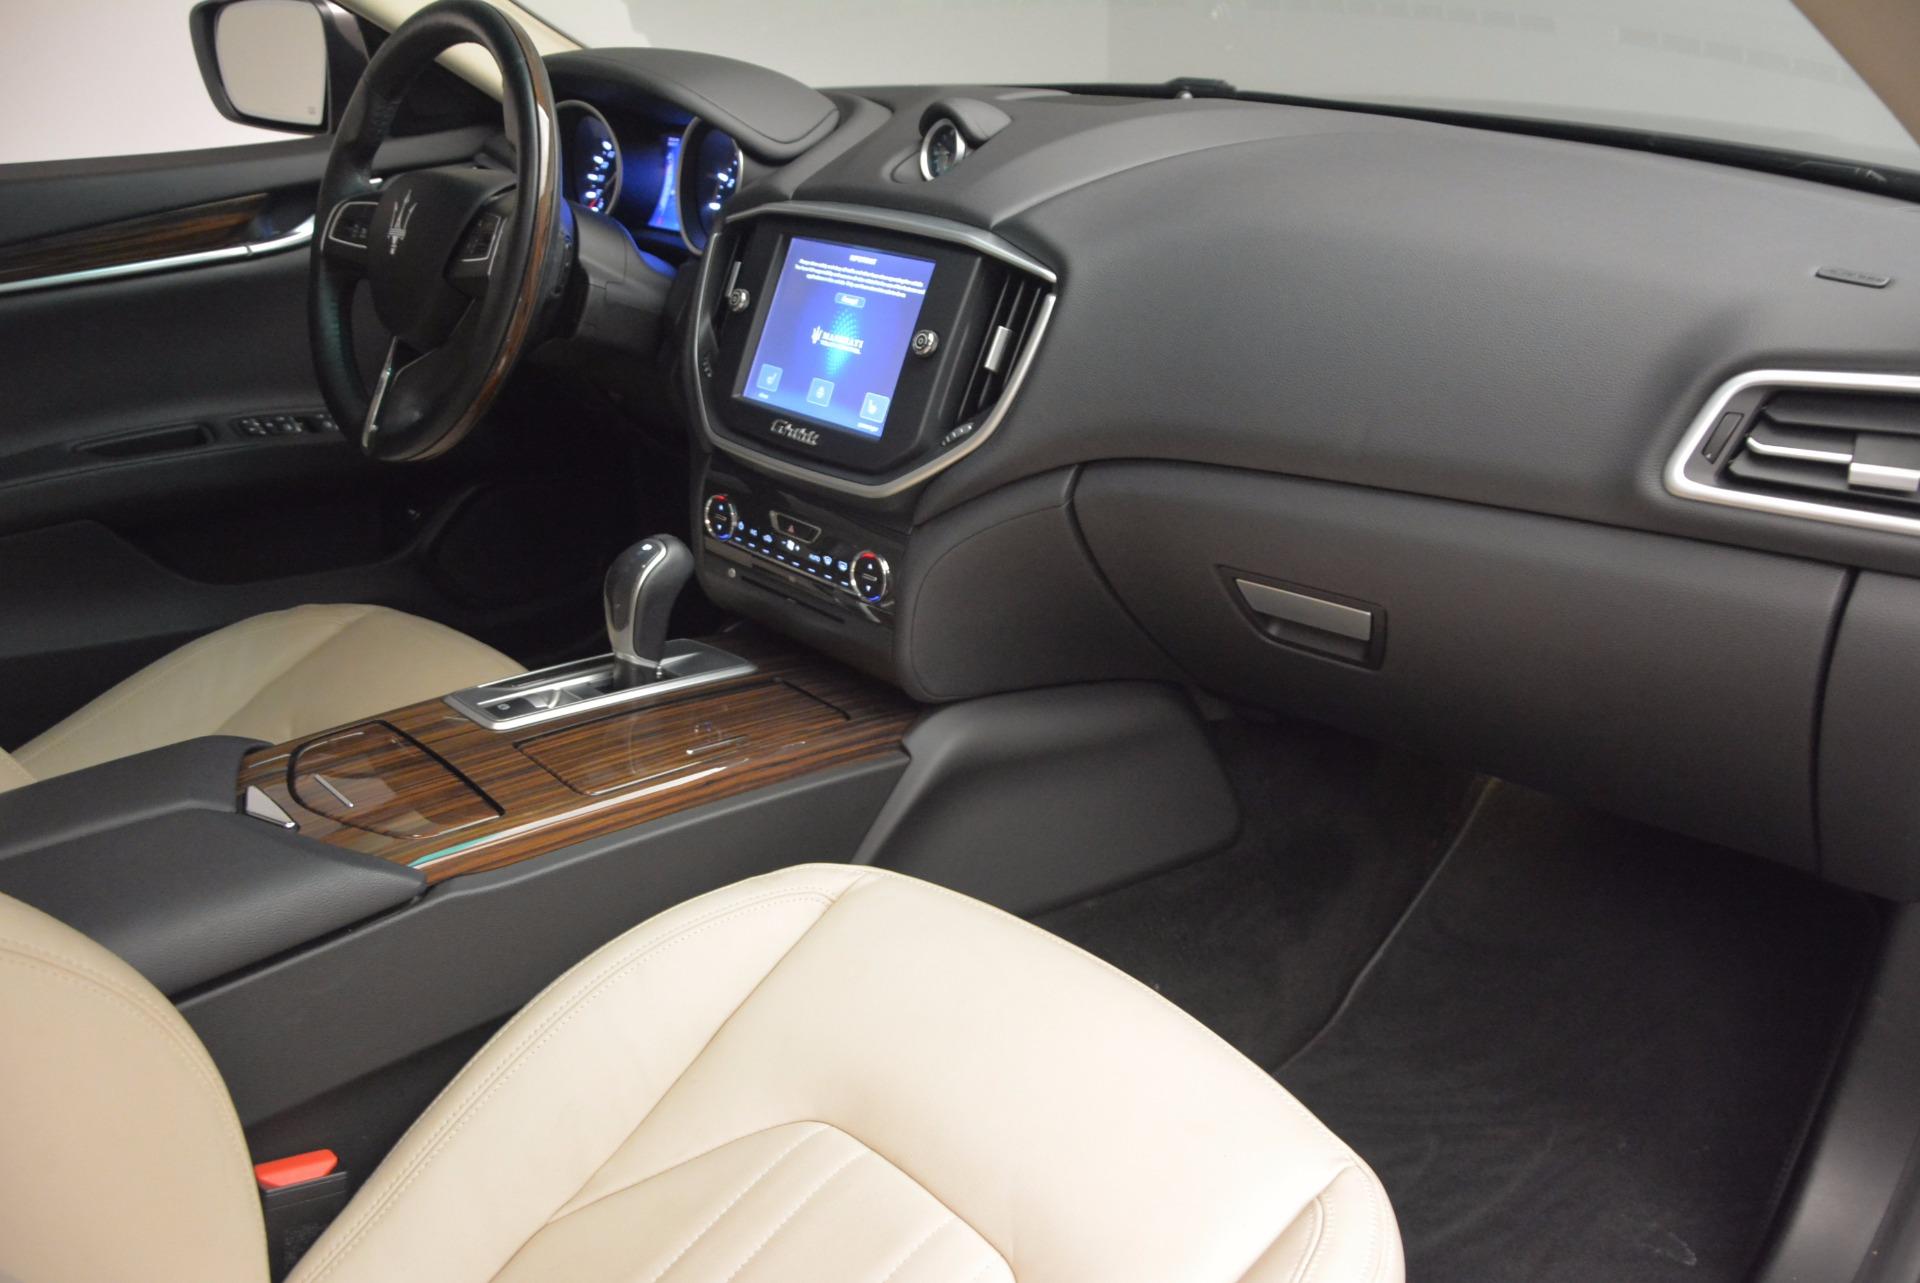 Used 2015 Maserati Ghibli S Q4 For Sale In Greenwich, CT 1059_p19